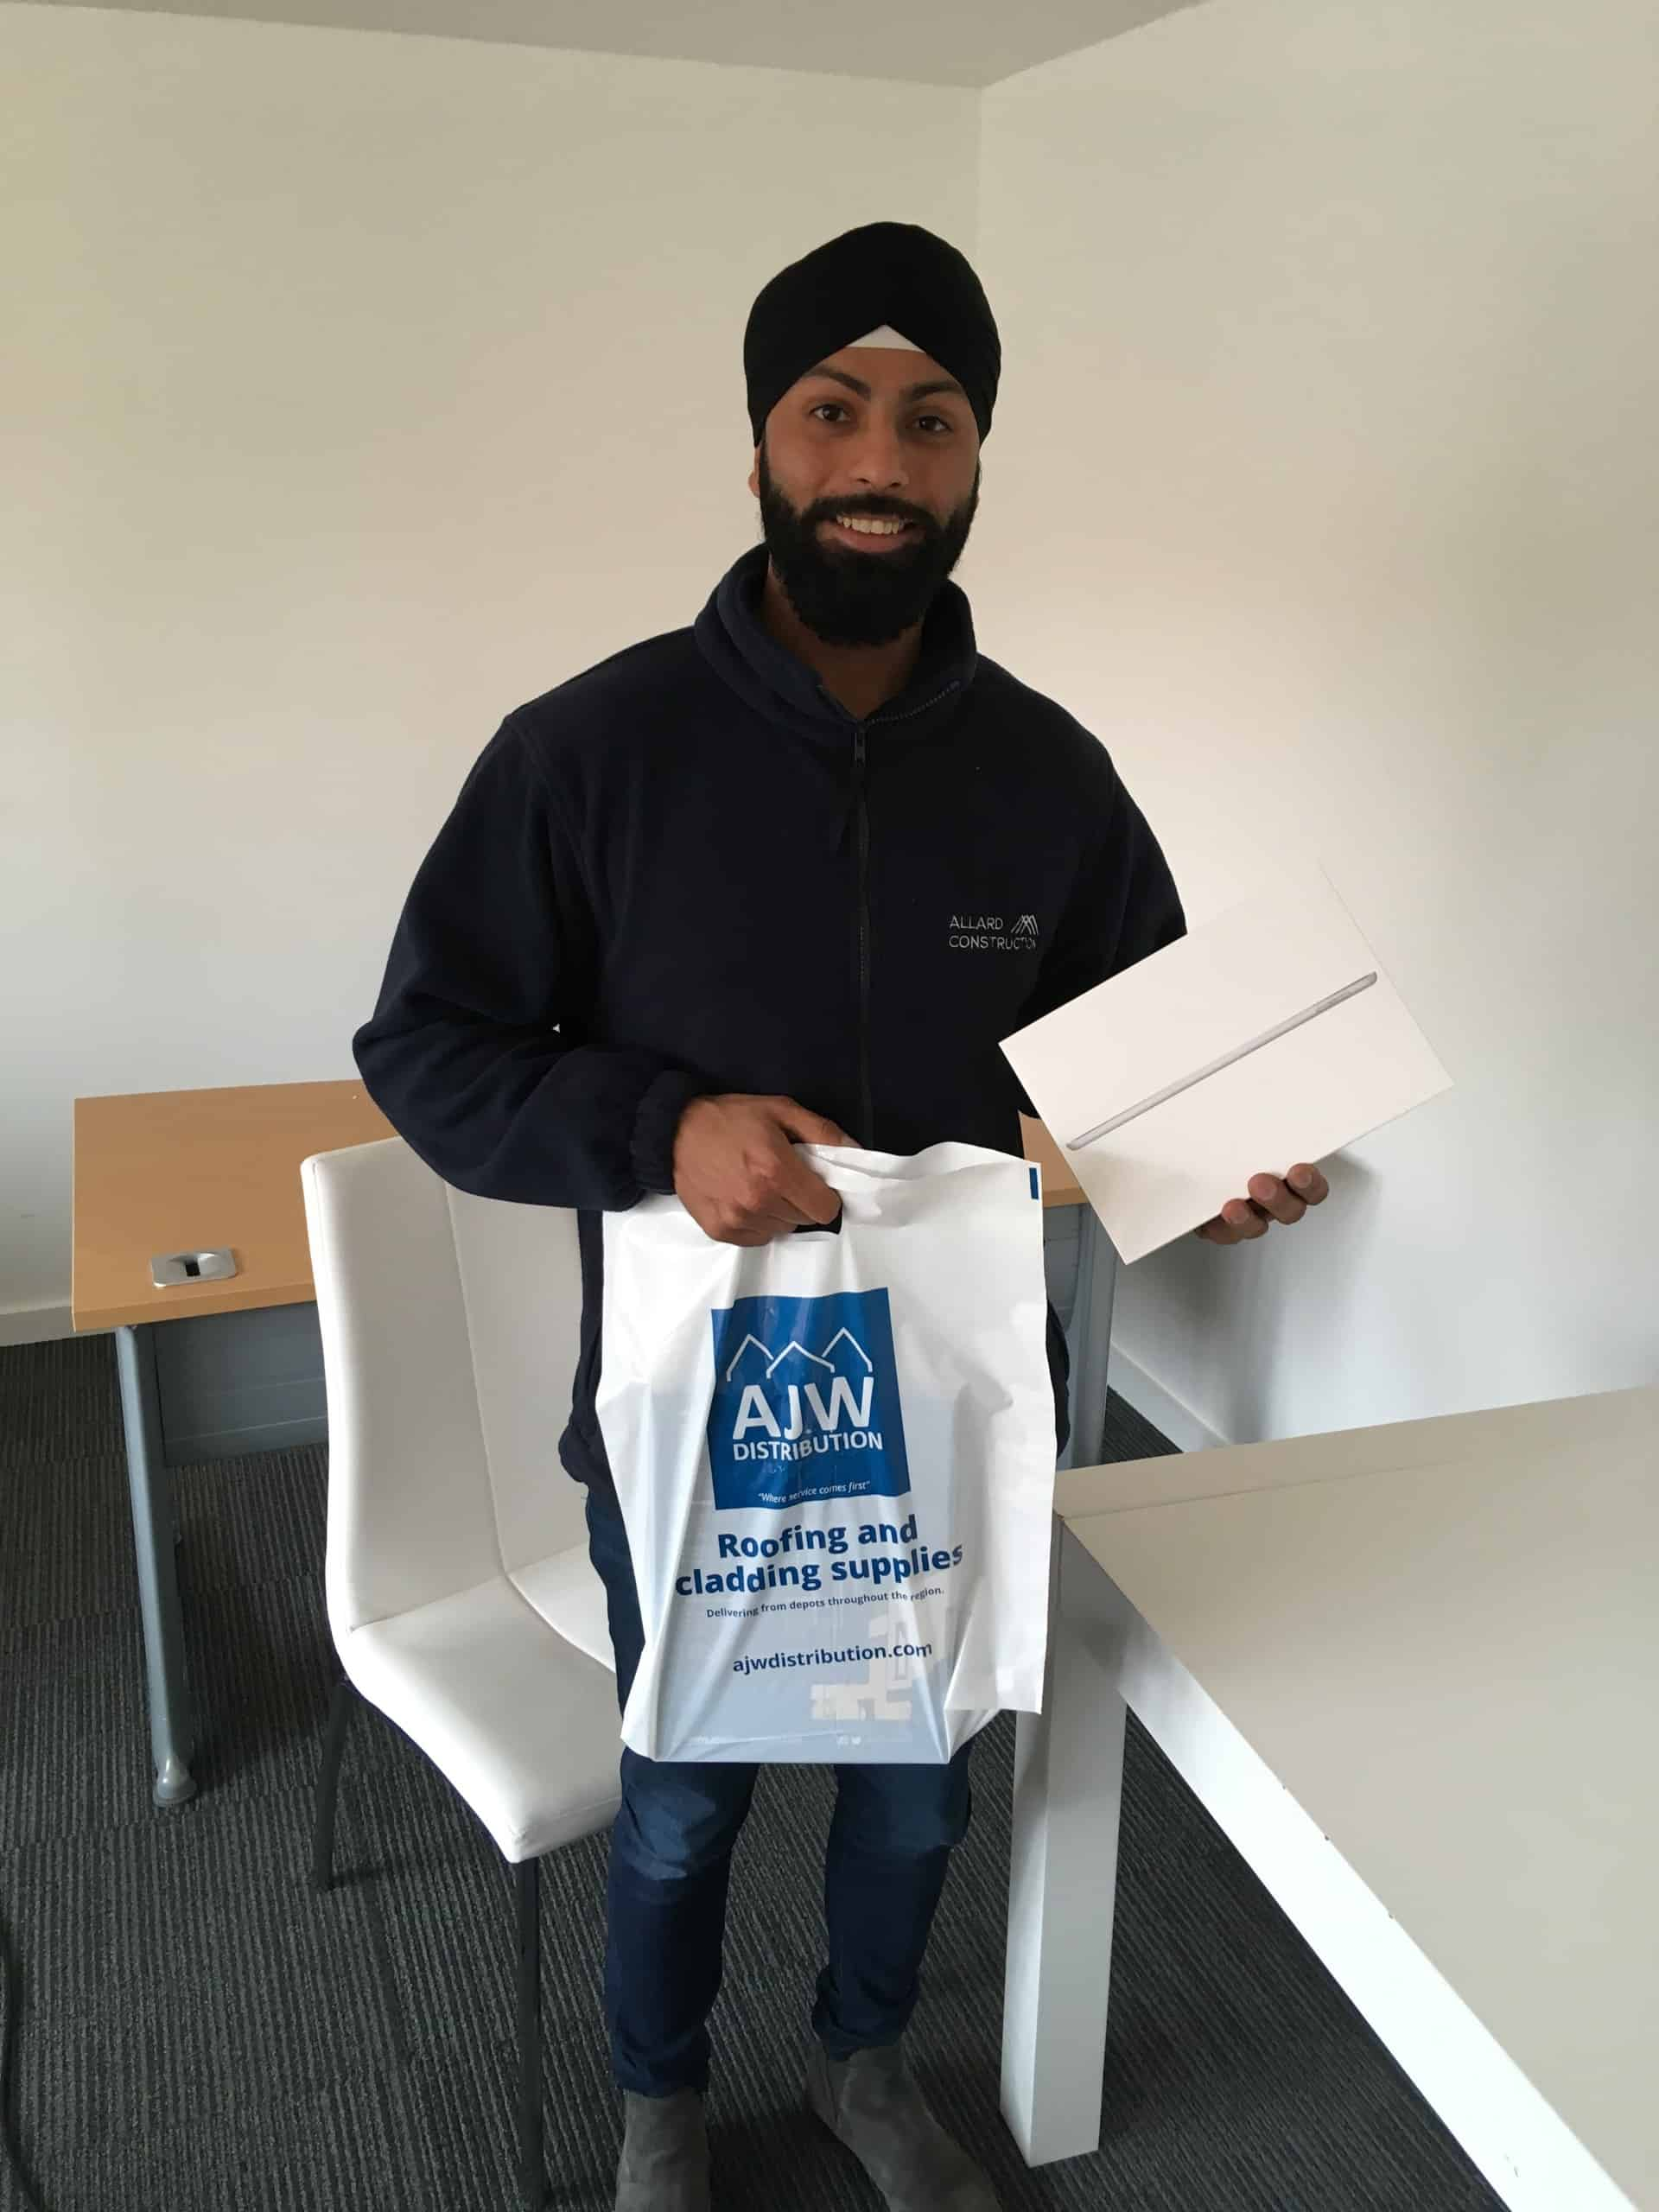 Gurpreet Singh from Allard Construction